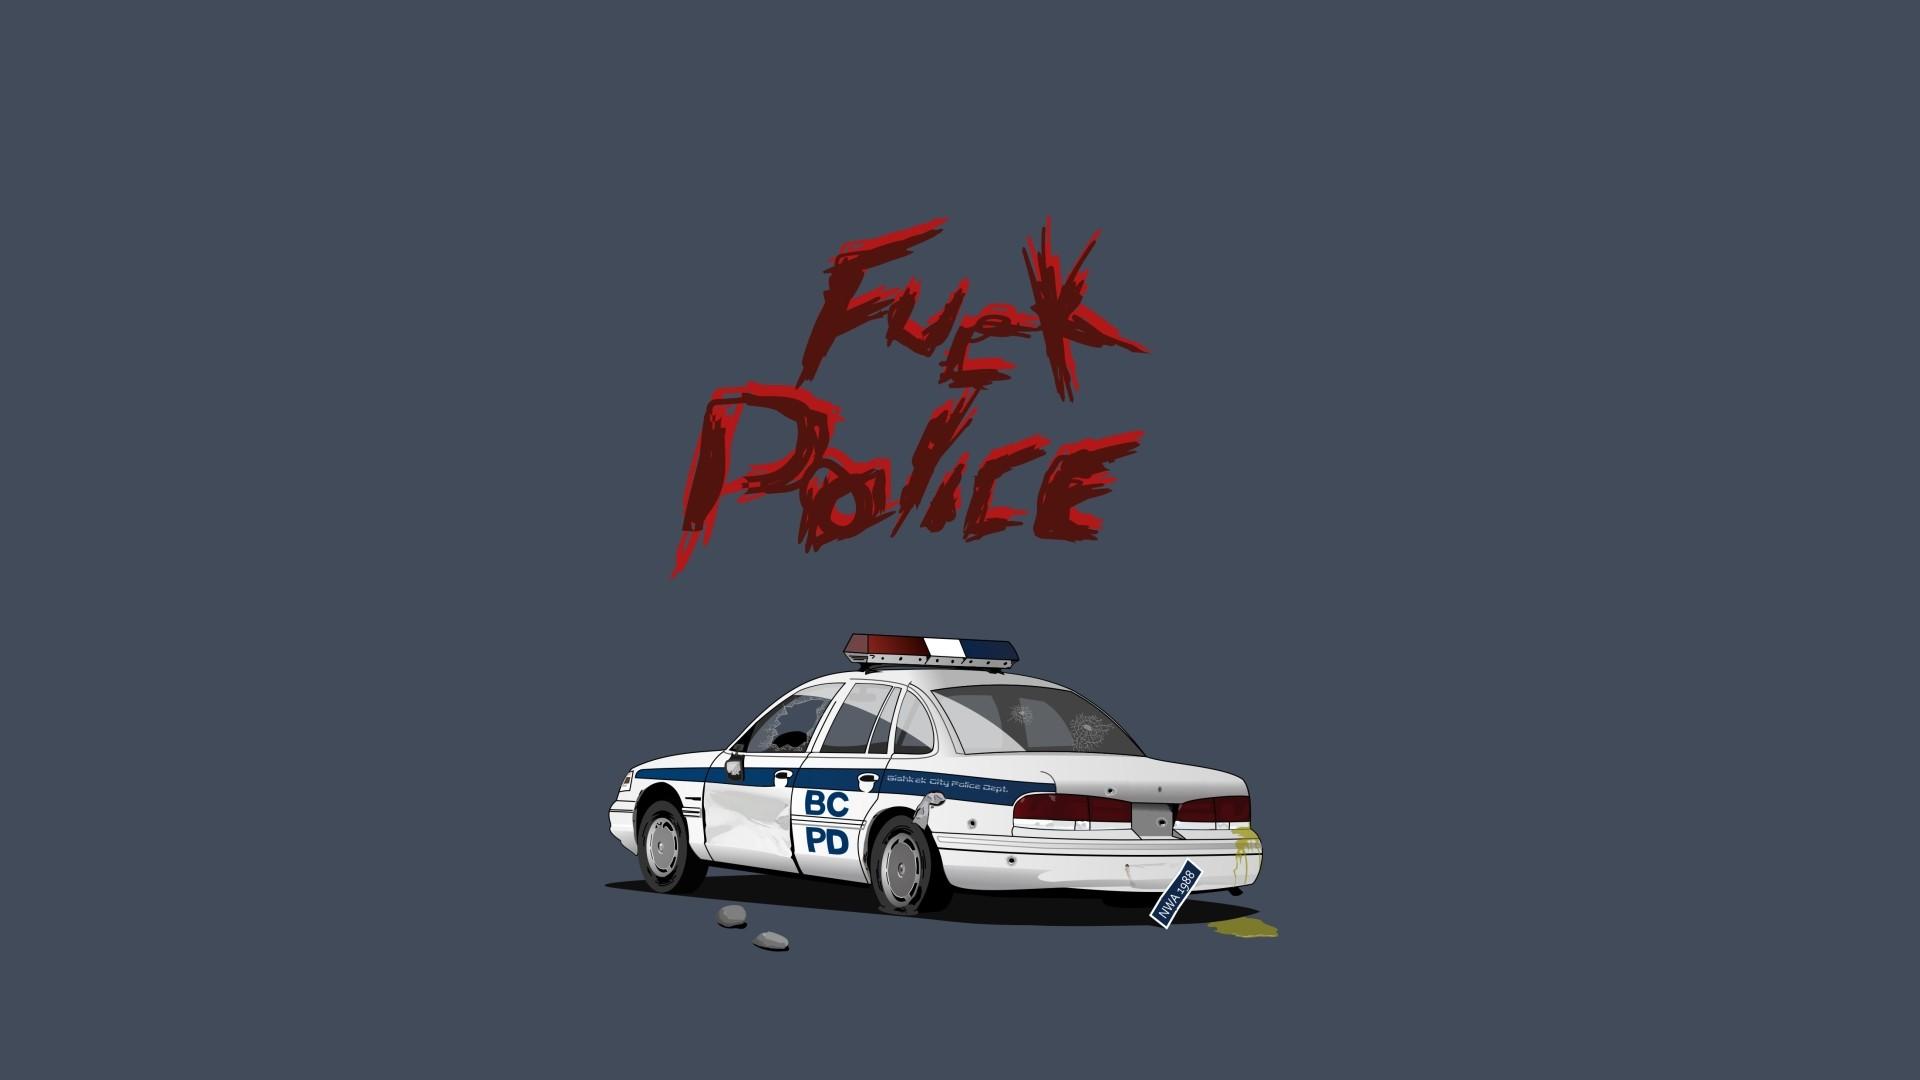 Fuck Police Wallpaper